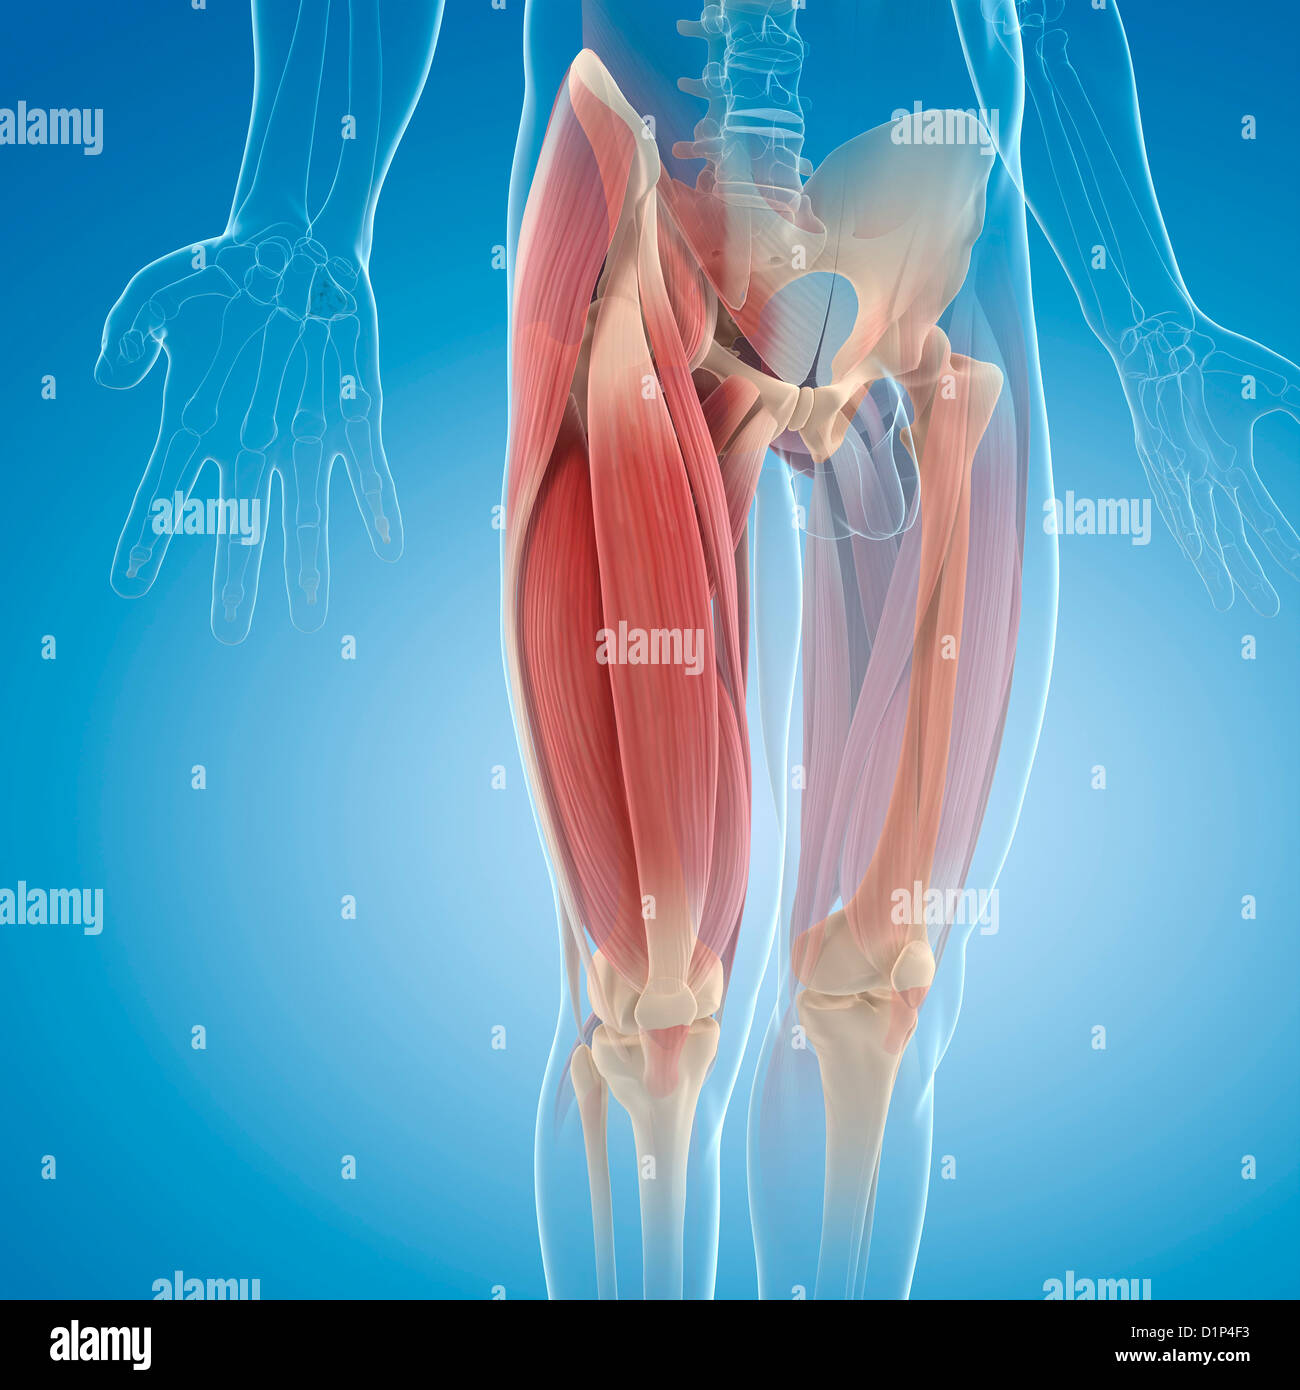 Upper Leg Muscles Stock Photos & Upper Leg Muscles Stock Images - Alamy